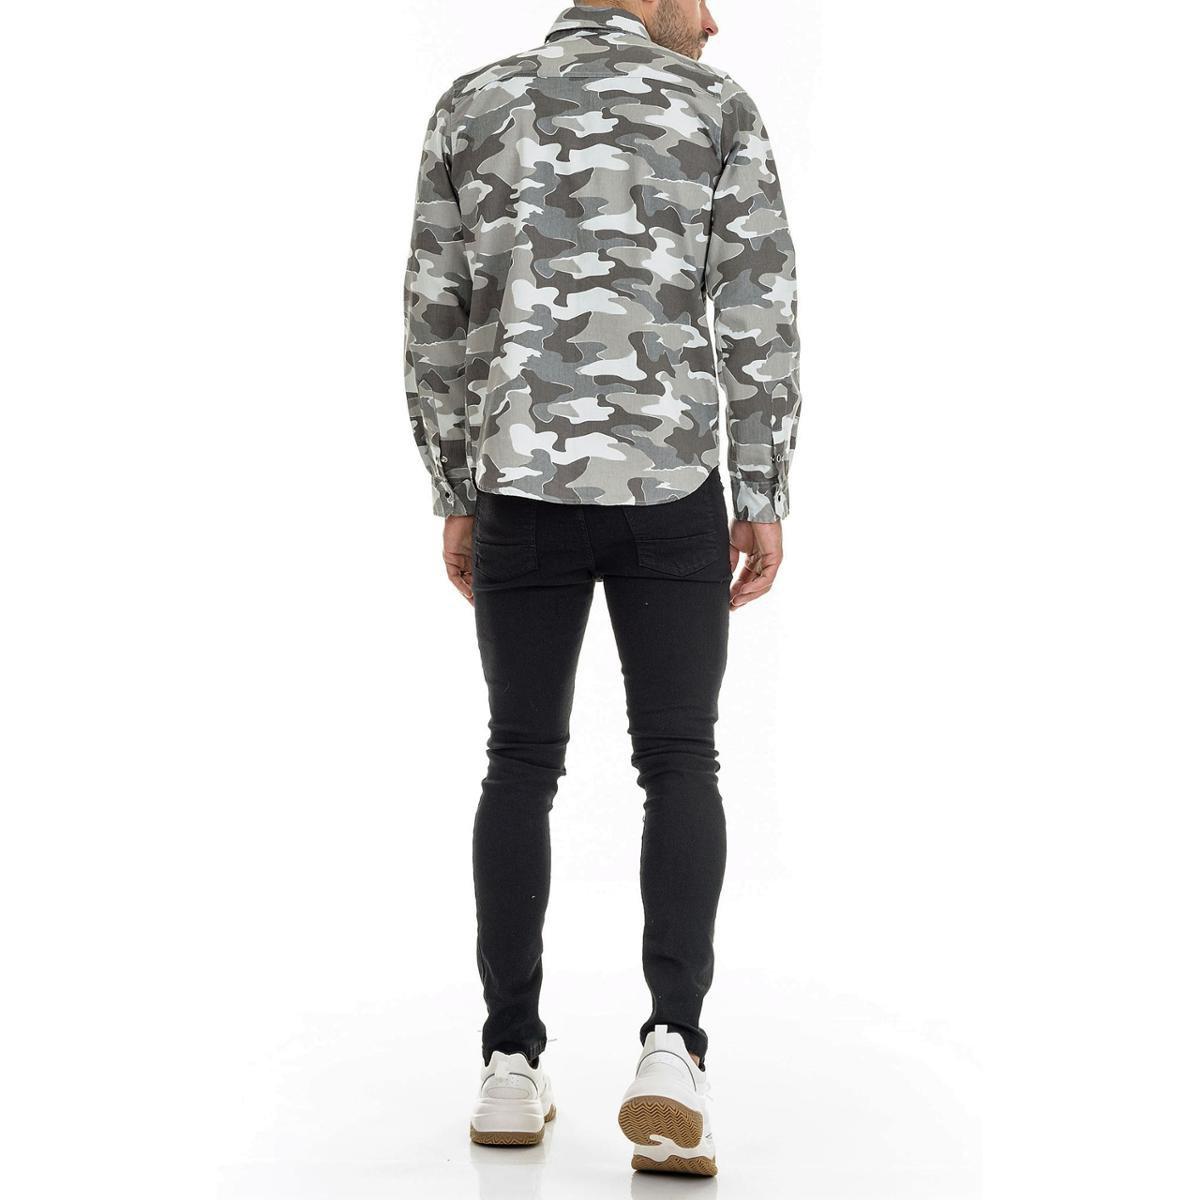 Camisa Offert Camuflado Urbano Premium Slim Fit Masculina - Cinza